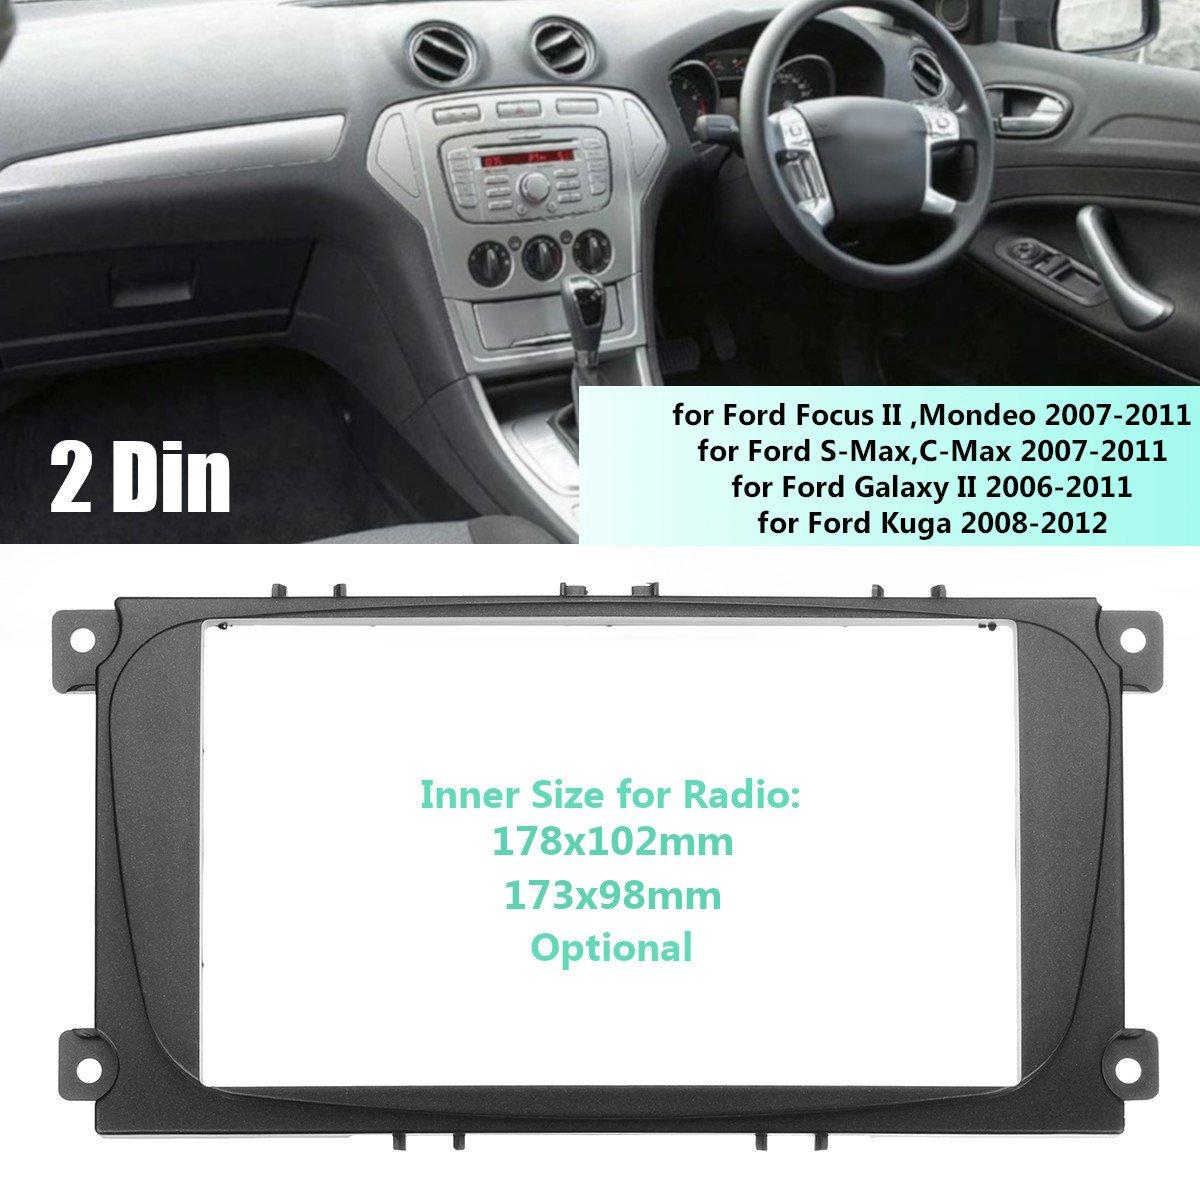 Daphot Store 2 Din Car Stereo Radio Fascia Panel Plate Daihatsu Copen Wiring Diagram Frame Cd Dvd Audio Dash Mount Trim Kit For Ford Focus Ii Kuga S Max Galaxy Home